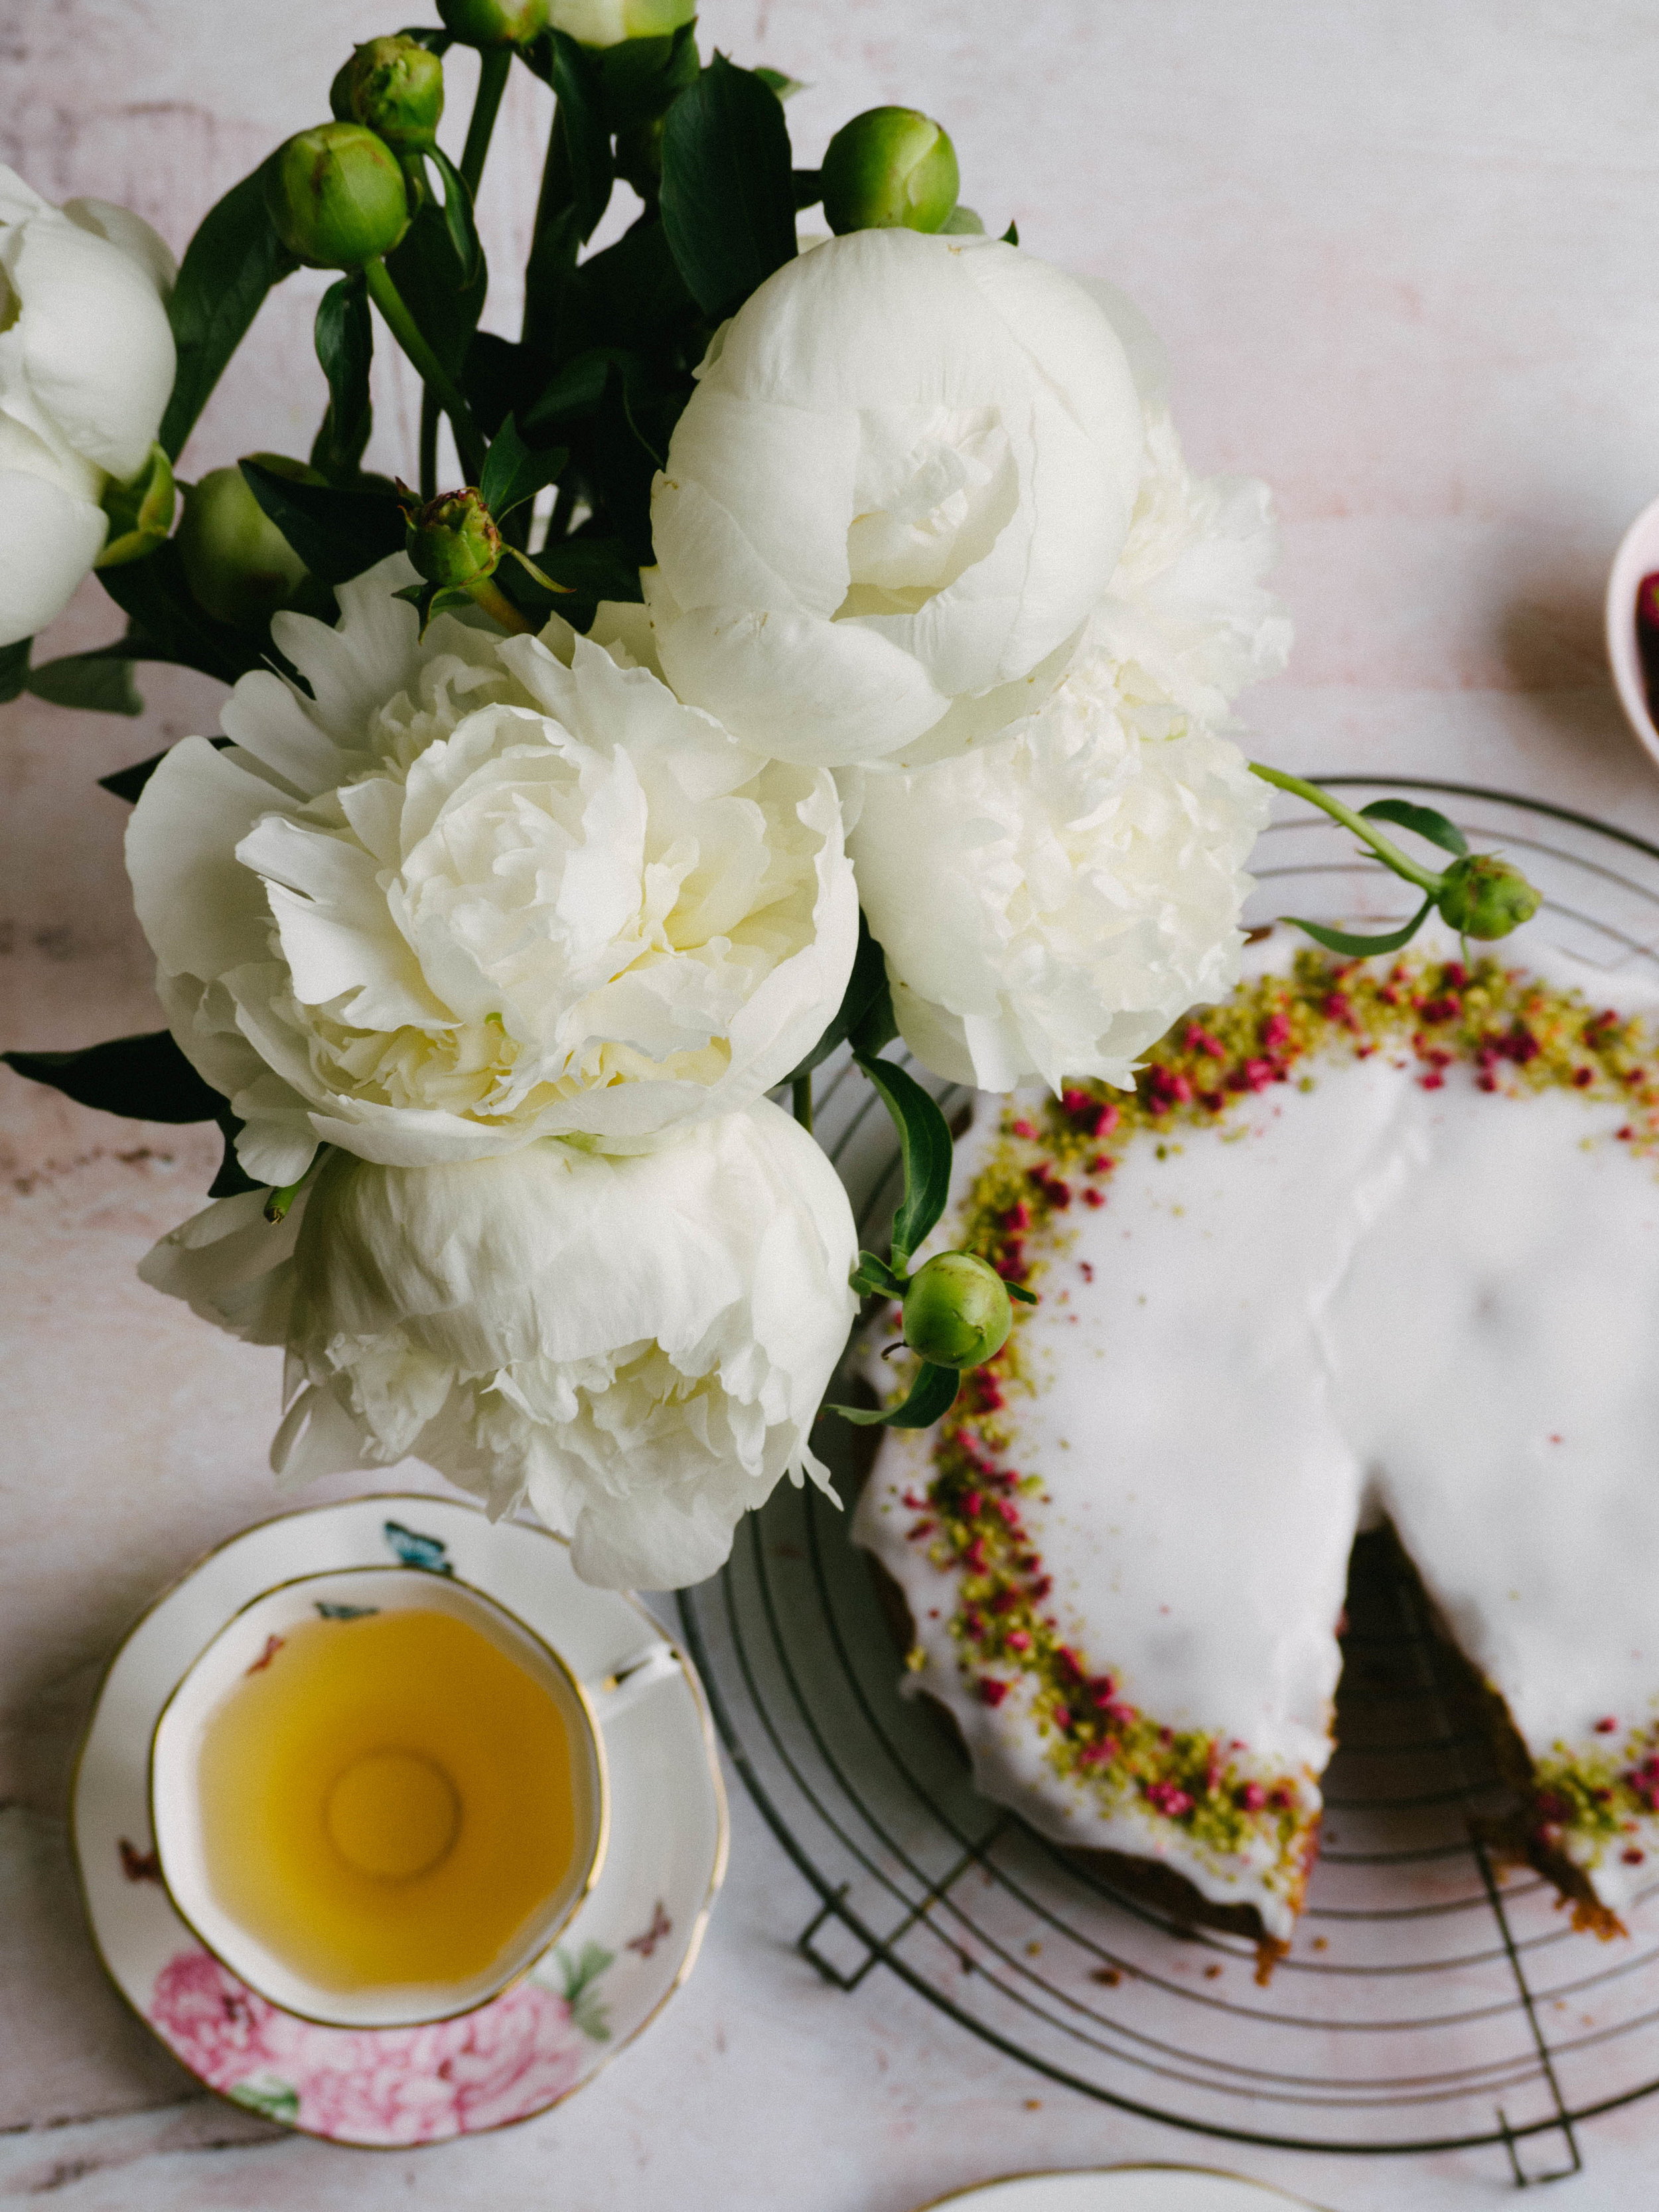 Pistachio Raspberry & Rose Cake with White Peonies